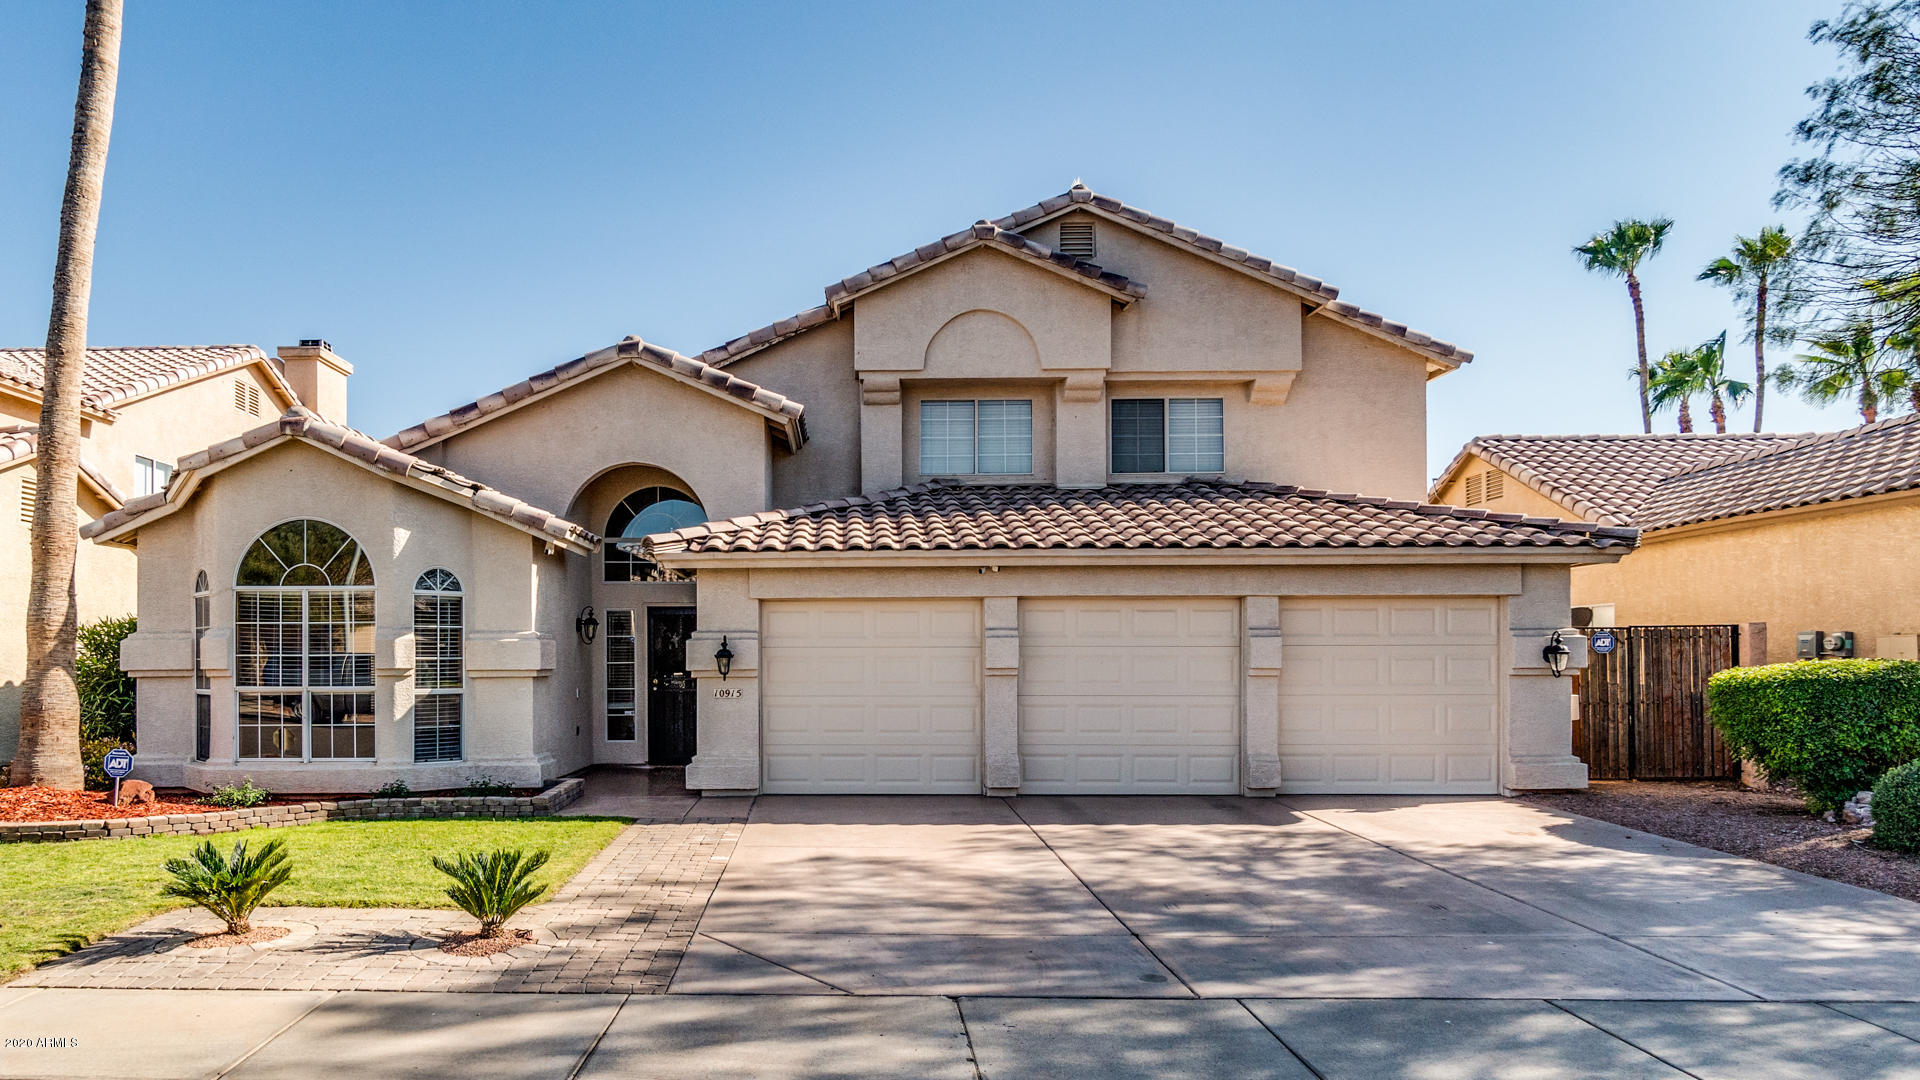 Photo of 10915 W LAURELWOOD Lane, Avondale, AZ 85392